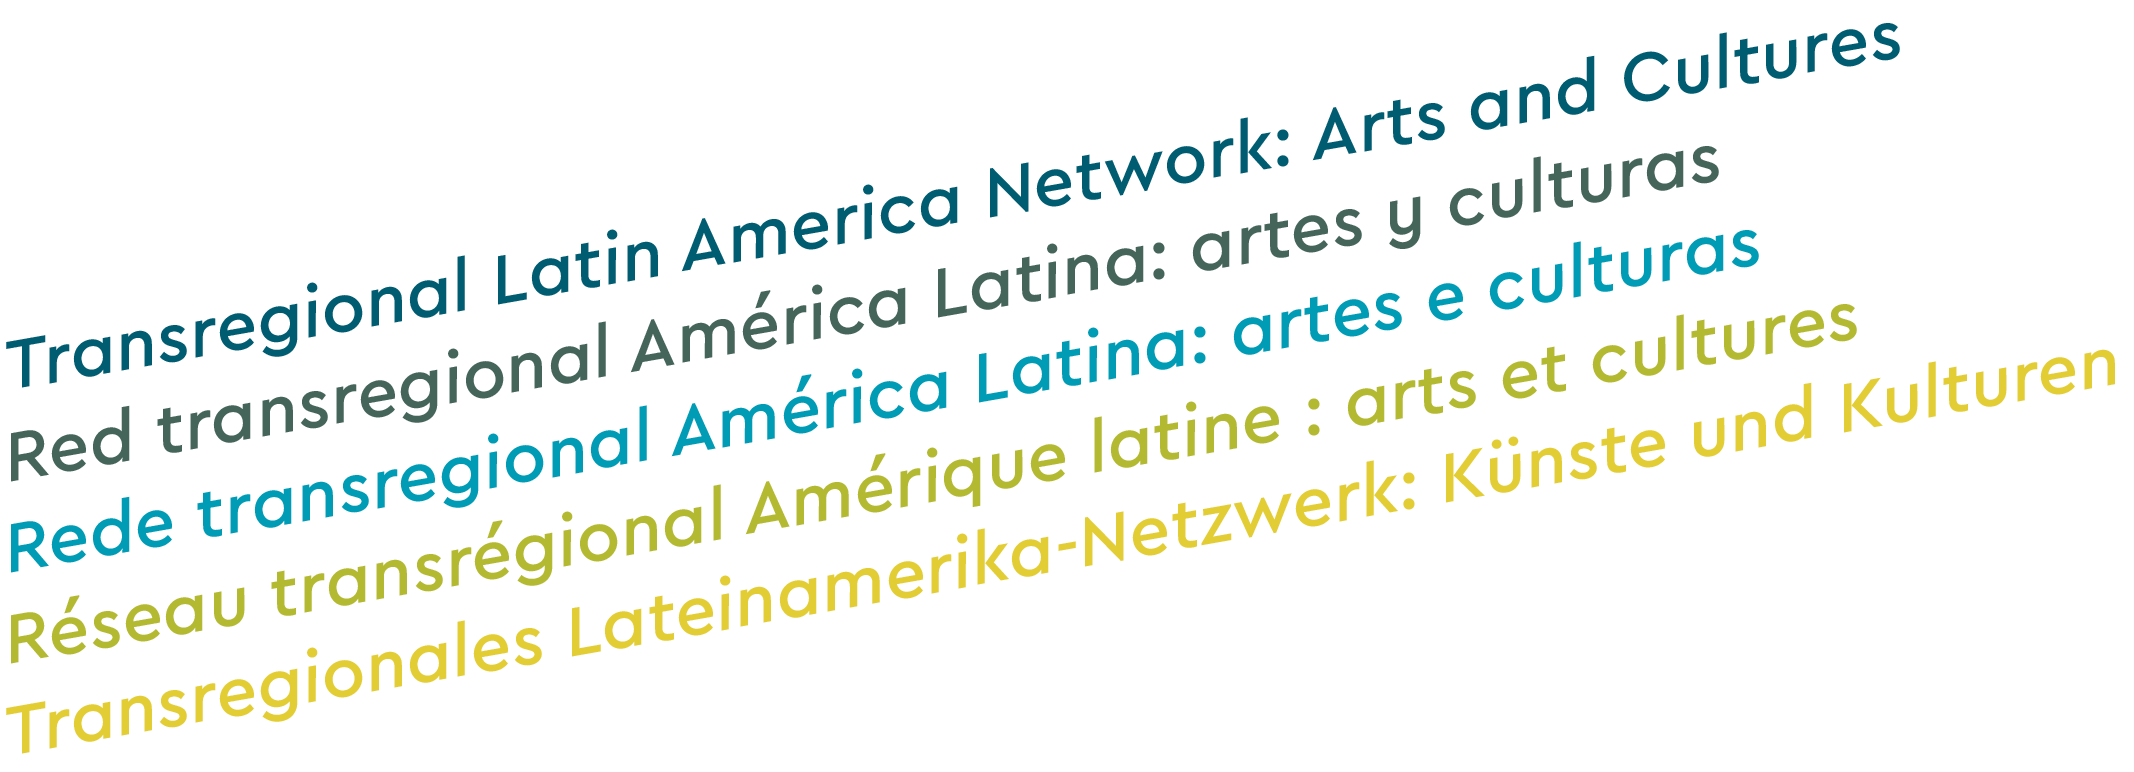 Transregional Latin America Network